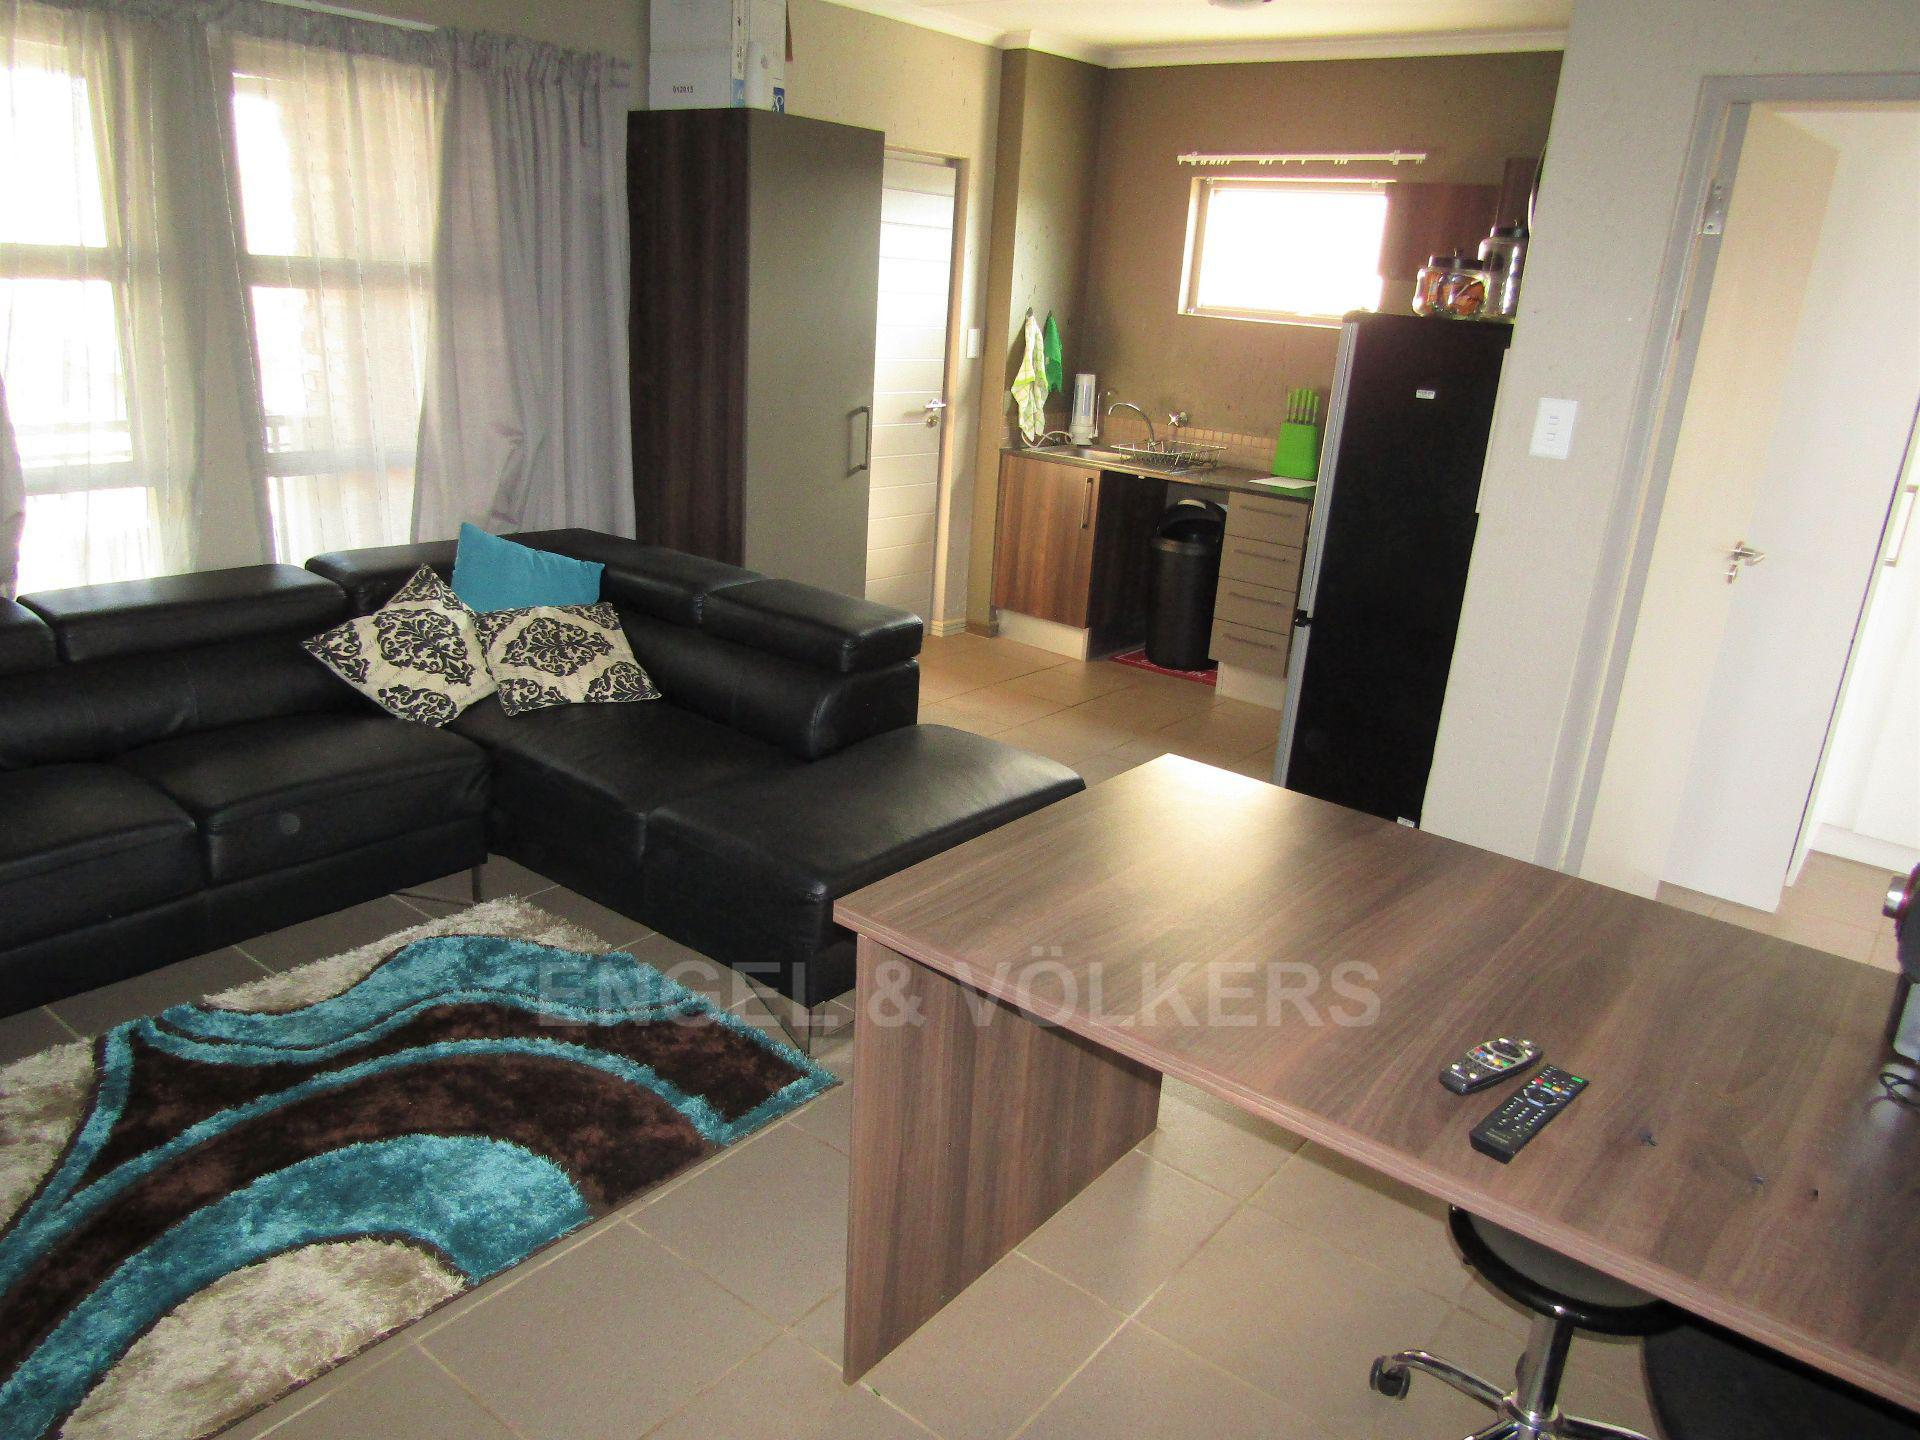 Van Der Hoff Park property for sale. Ref No: 13498718. Picture no 4